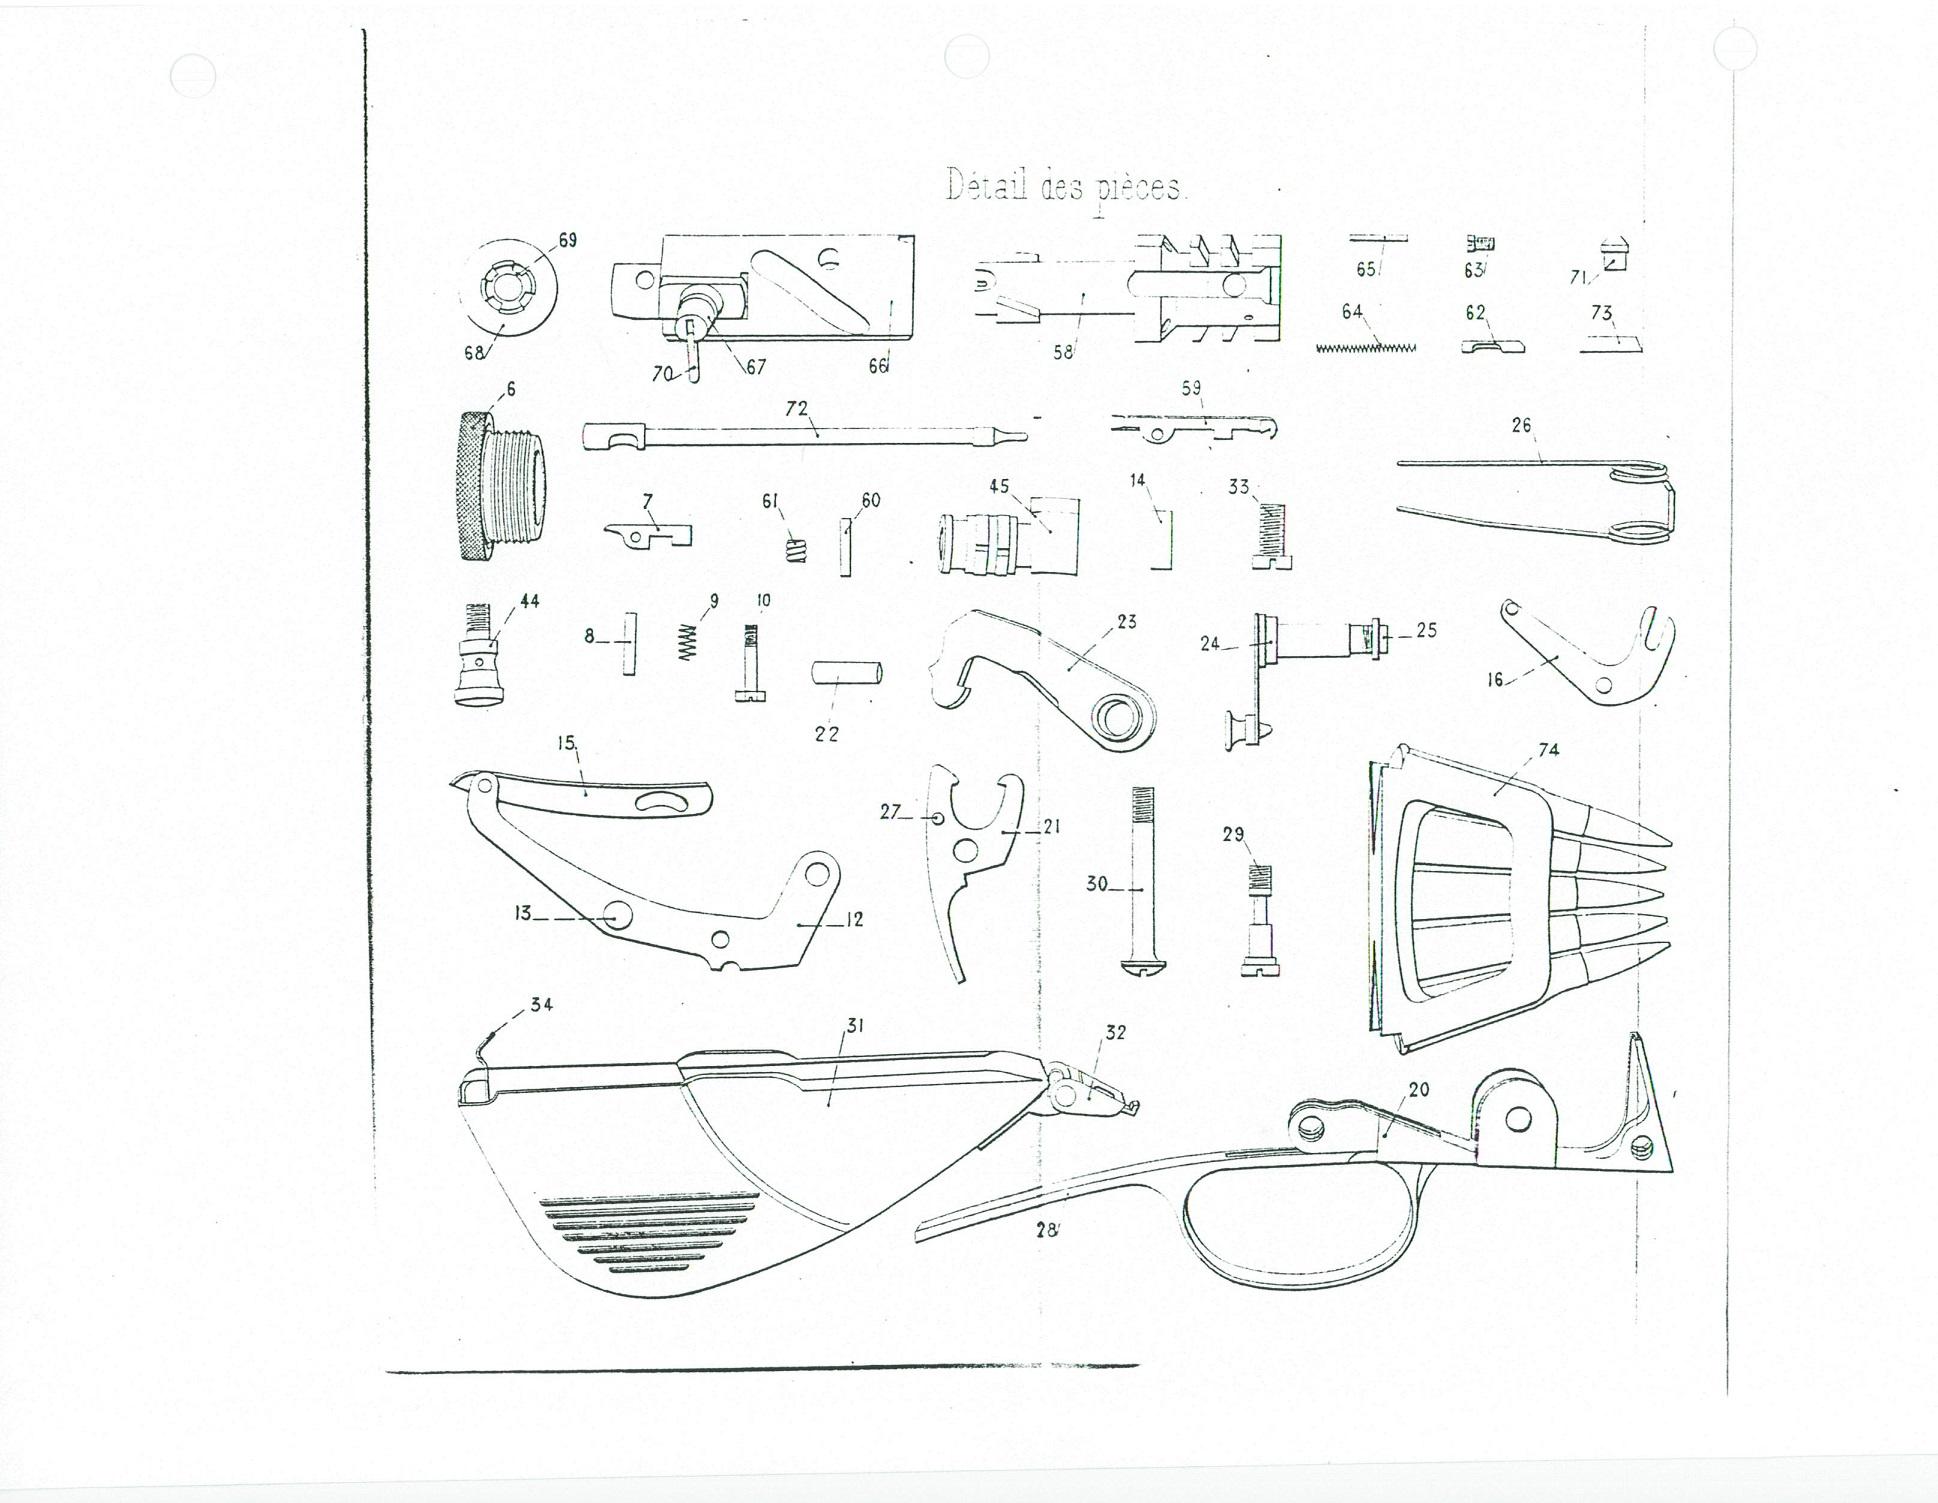 Gunlab Part 19 Taurus 25 Acp Schematic Picture 1 Small